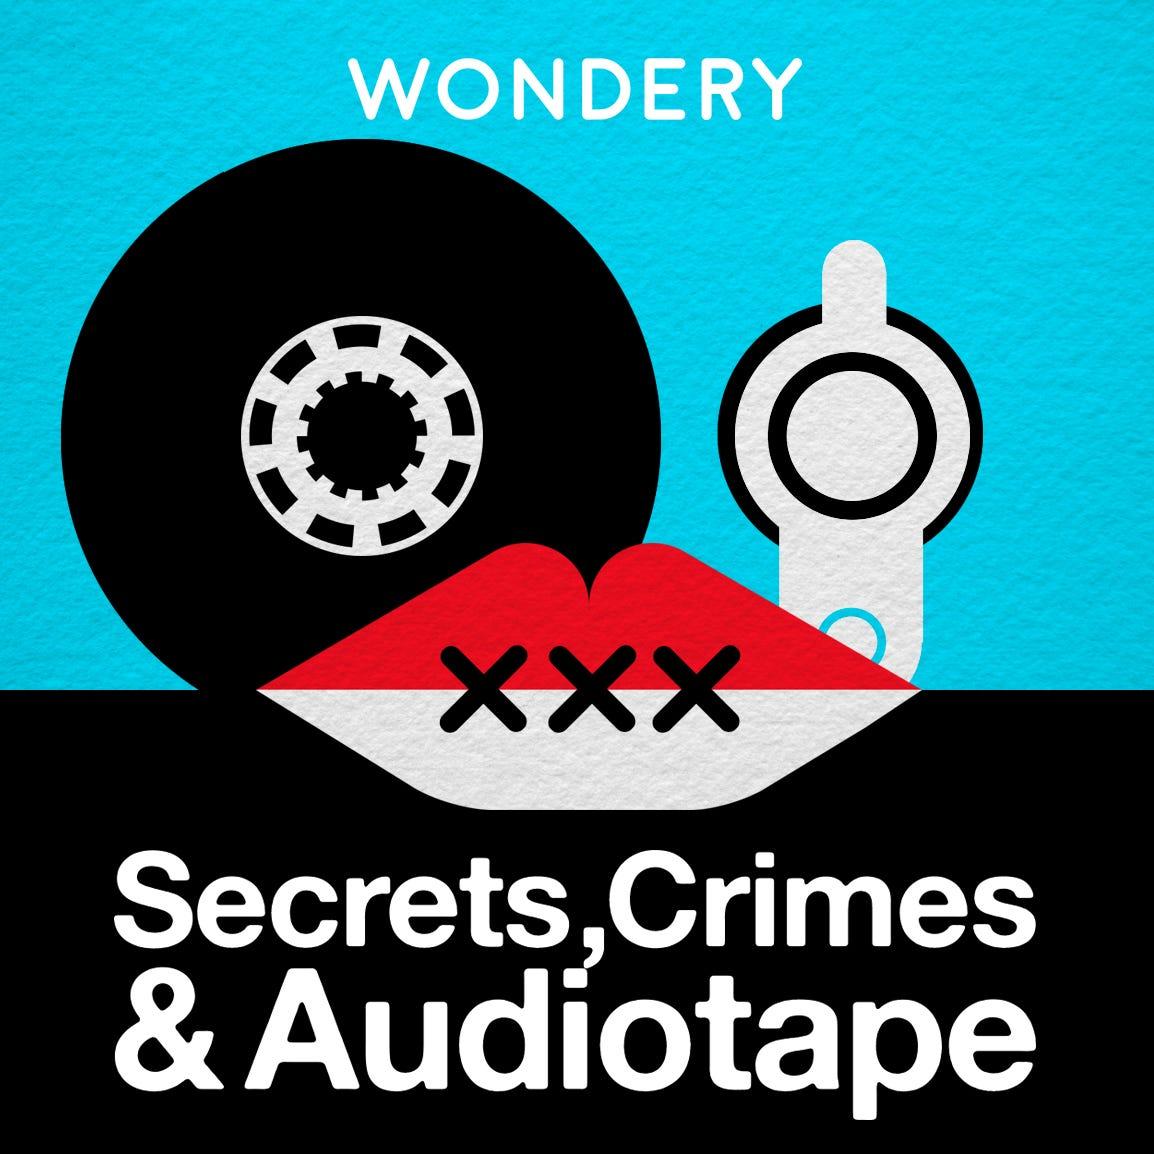 Podcast pick: Hear the 'Handmaid's Tale'